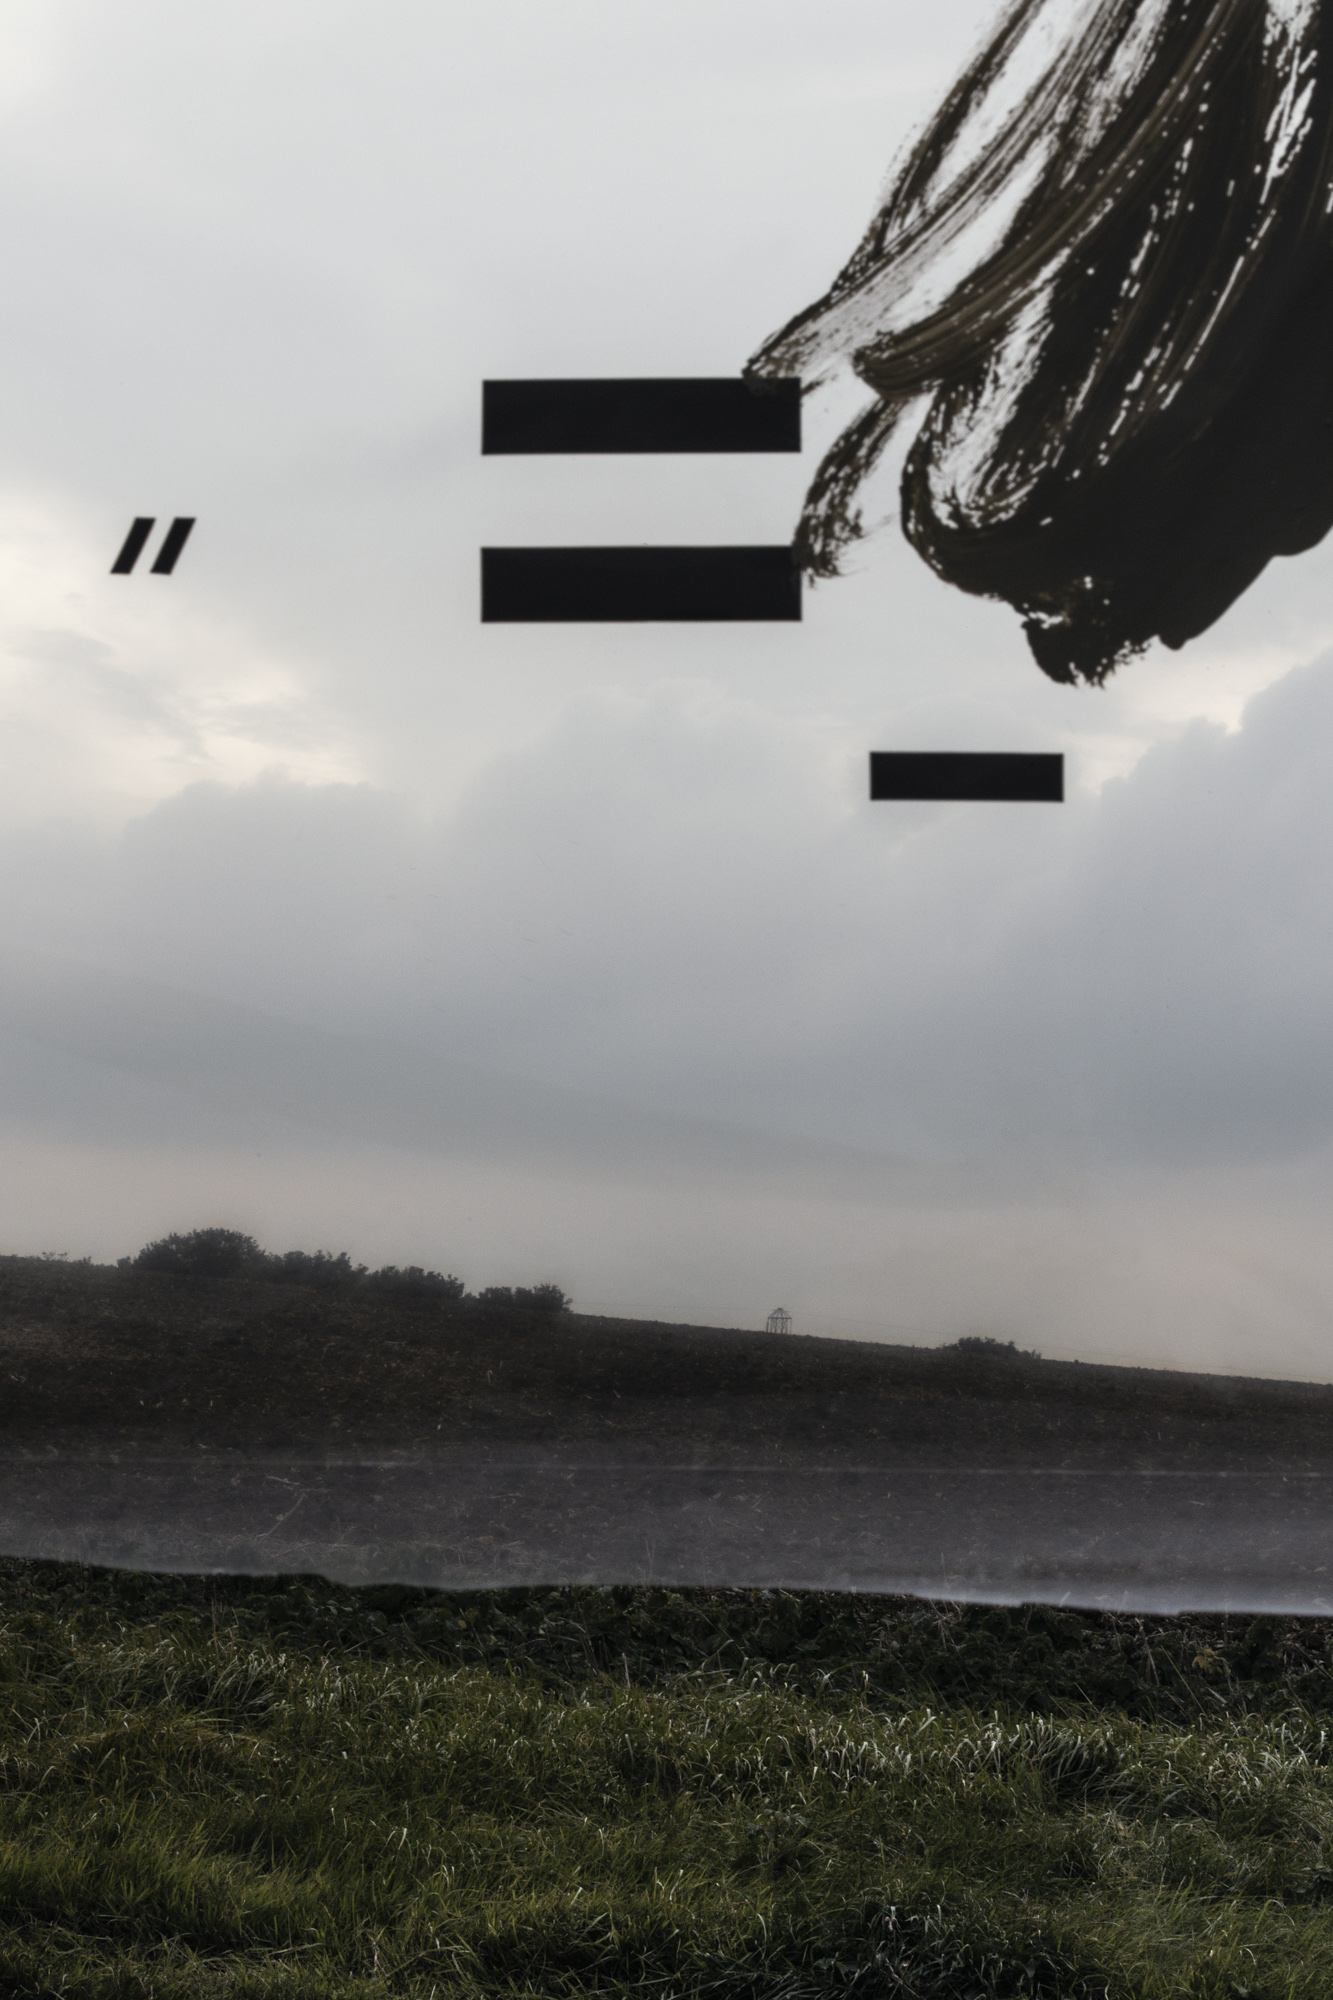 RRodner-Dichotomies-Code landscapes-8.jpg